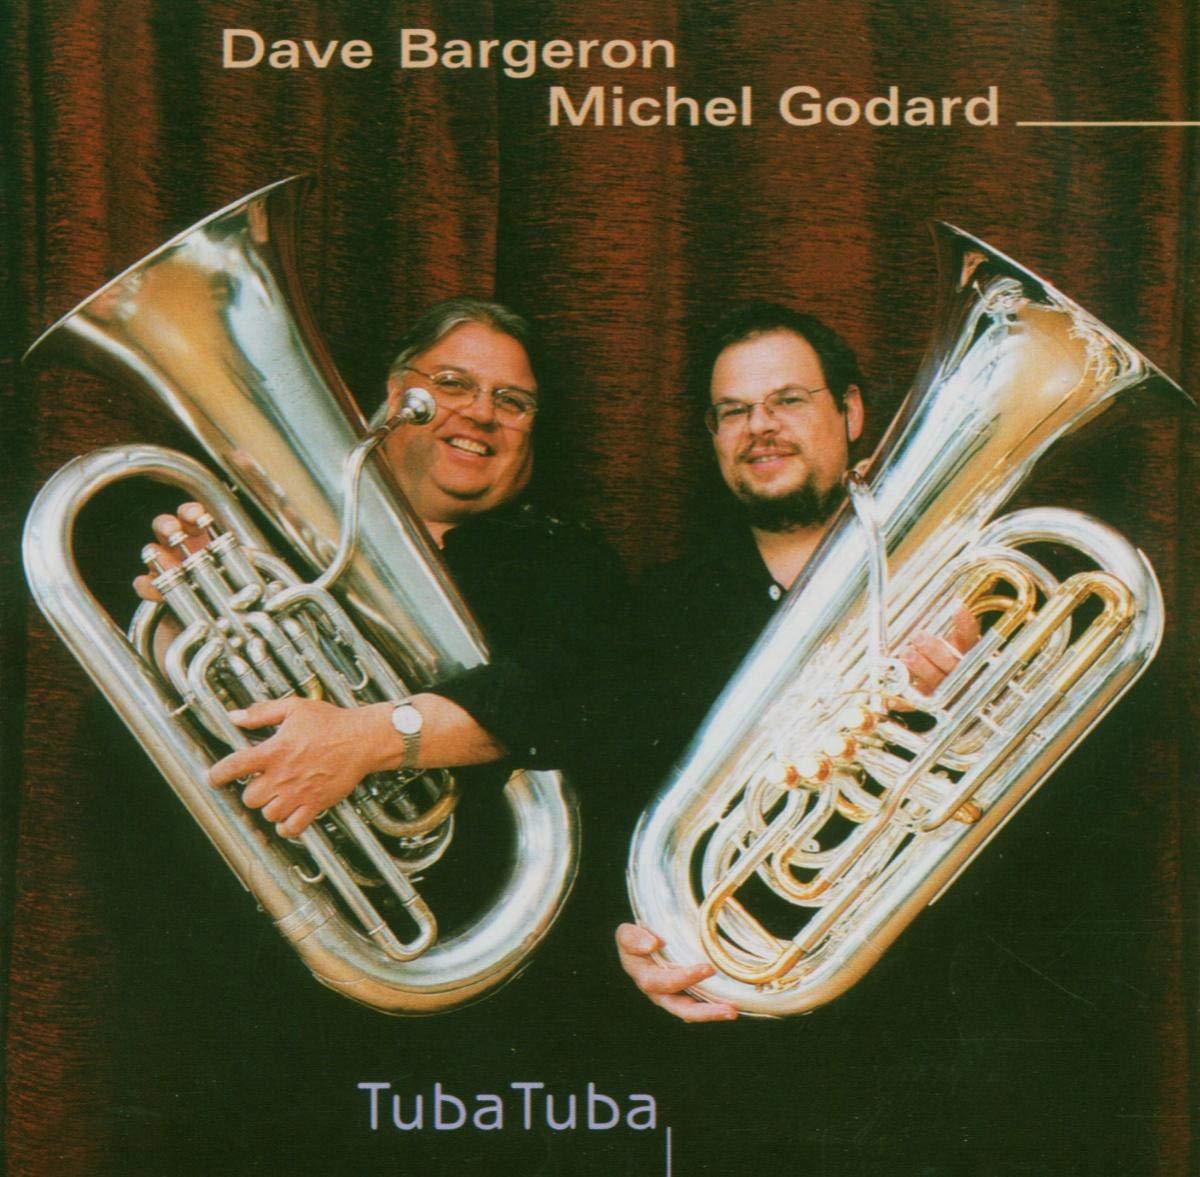 Tuba Cash special price Super intense SALE